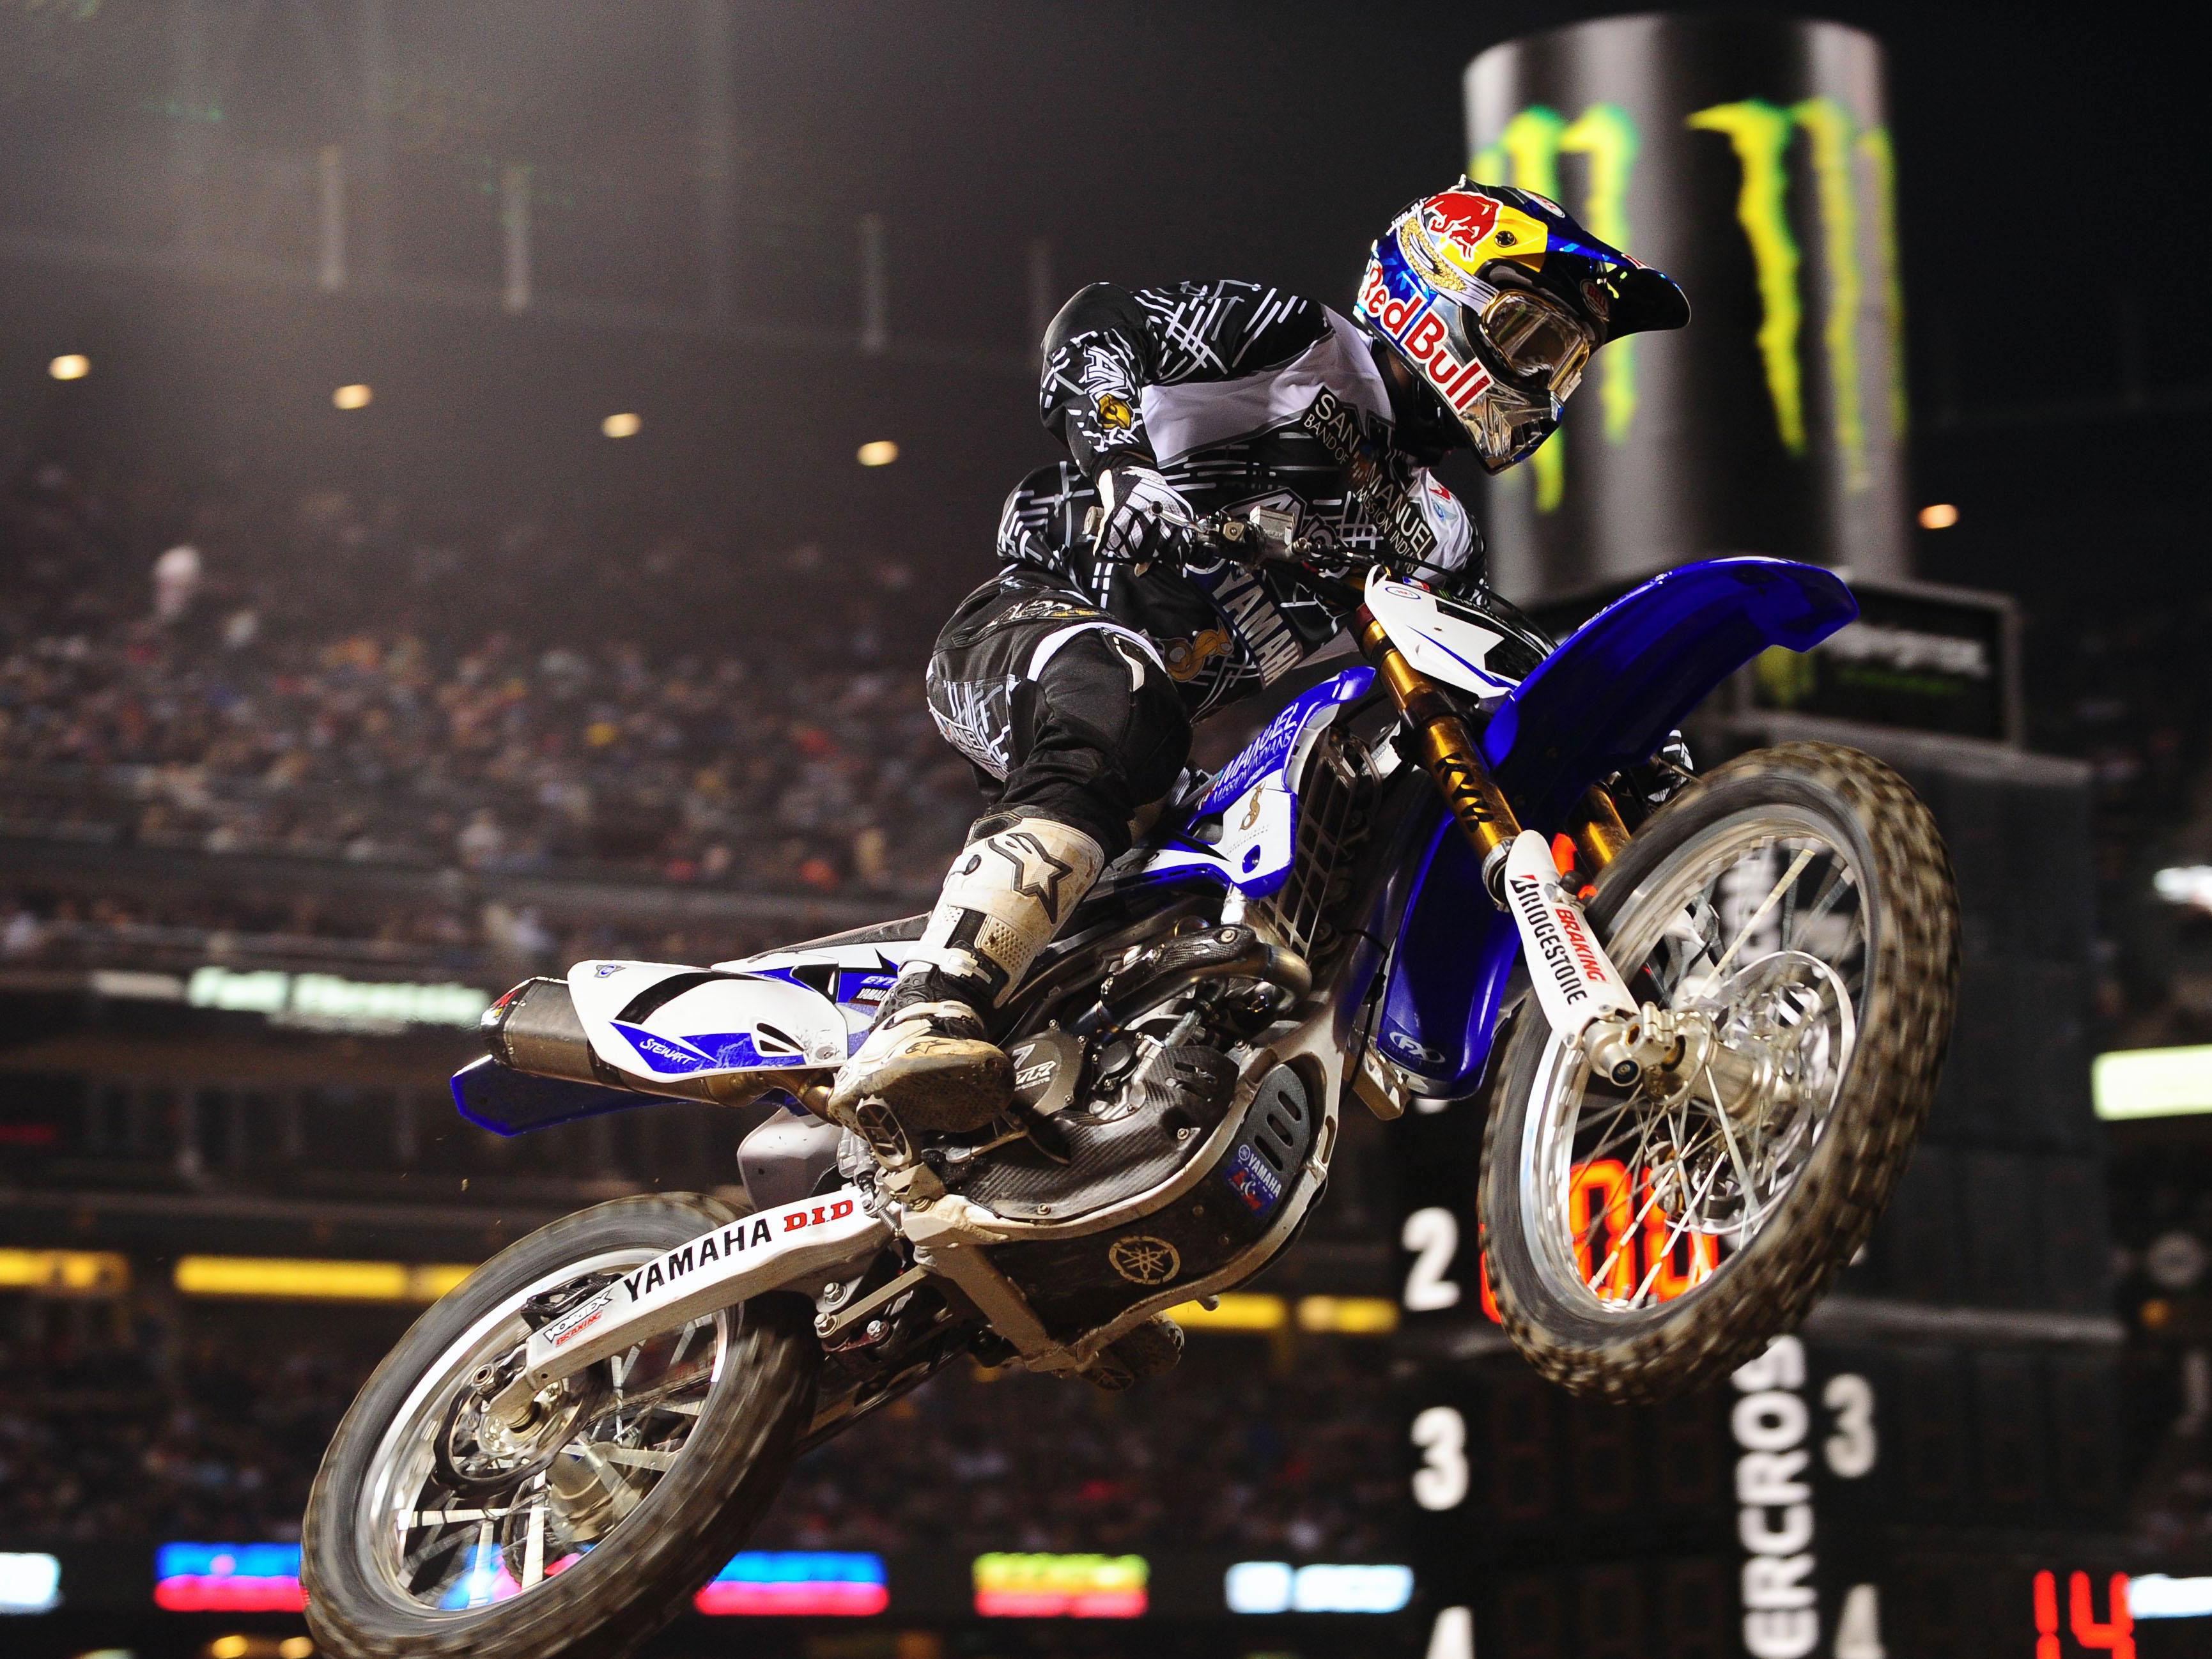 James Stewart (Yamaha), por fin líder